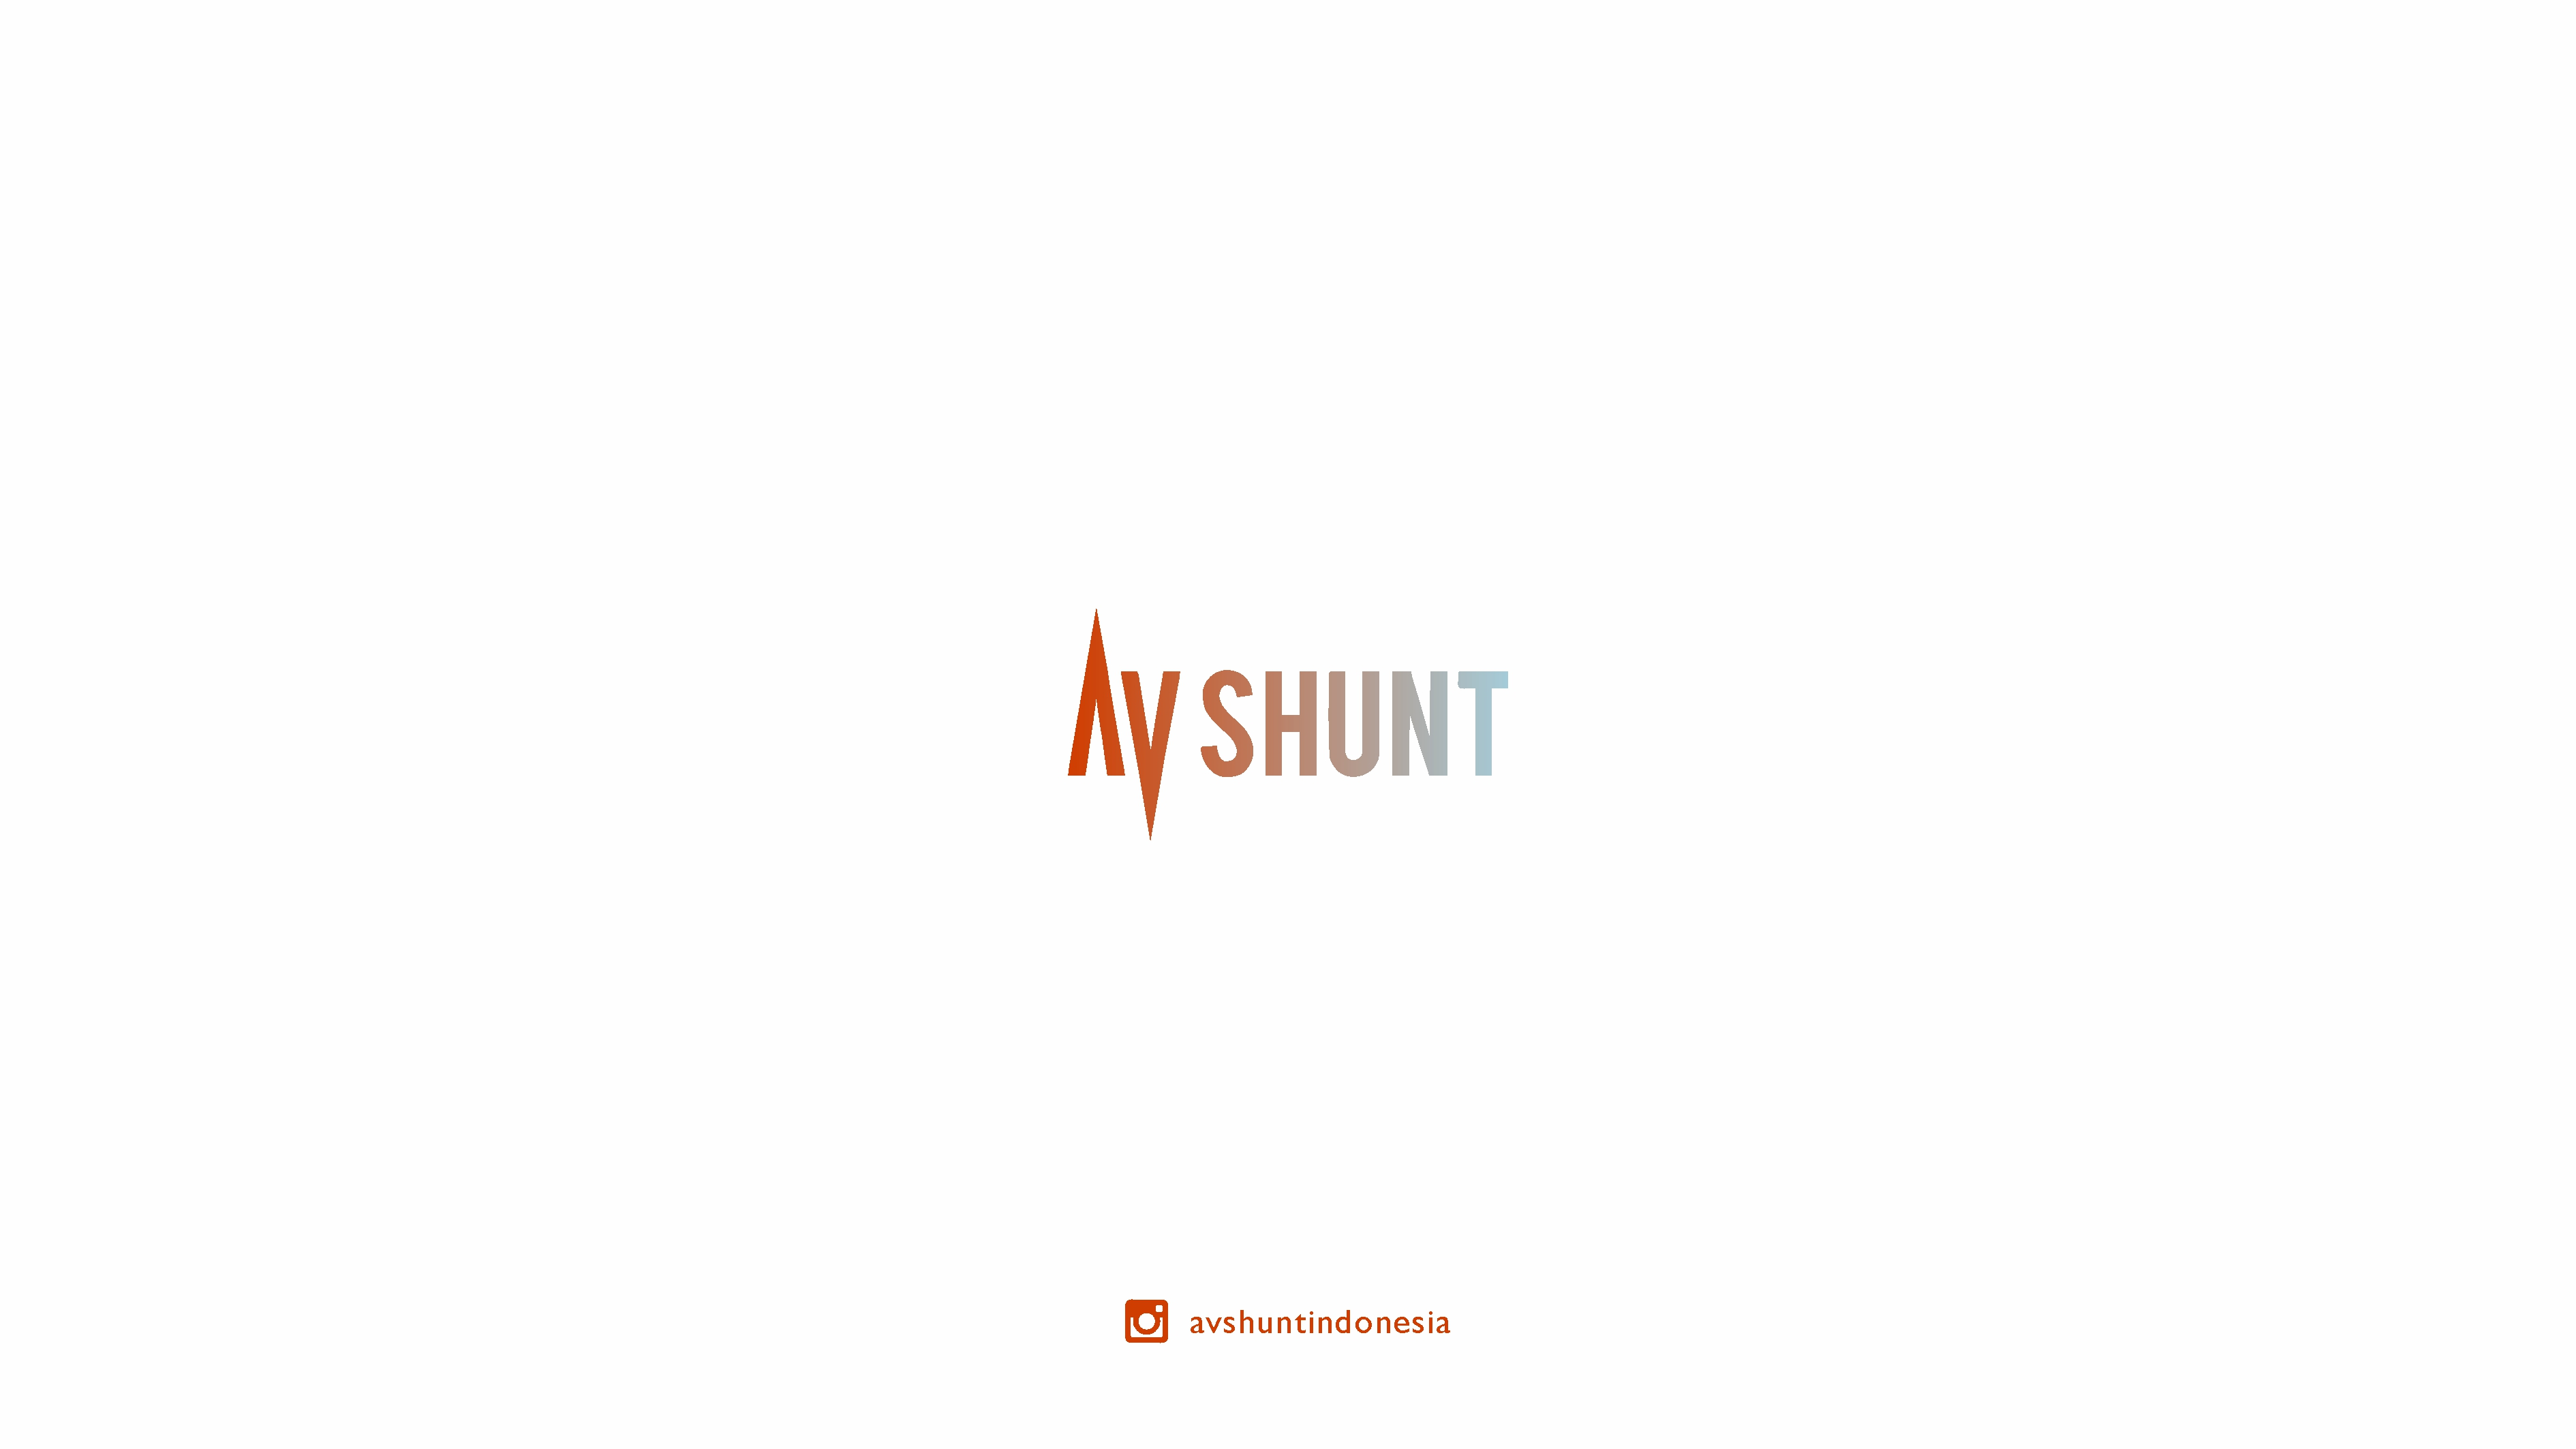 http://avshuntindonesia.com/images/advertisement/ADS__test-iklan__20180211073643.jpg